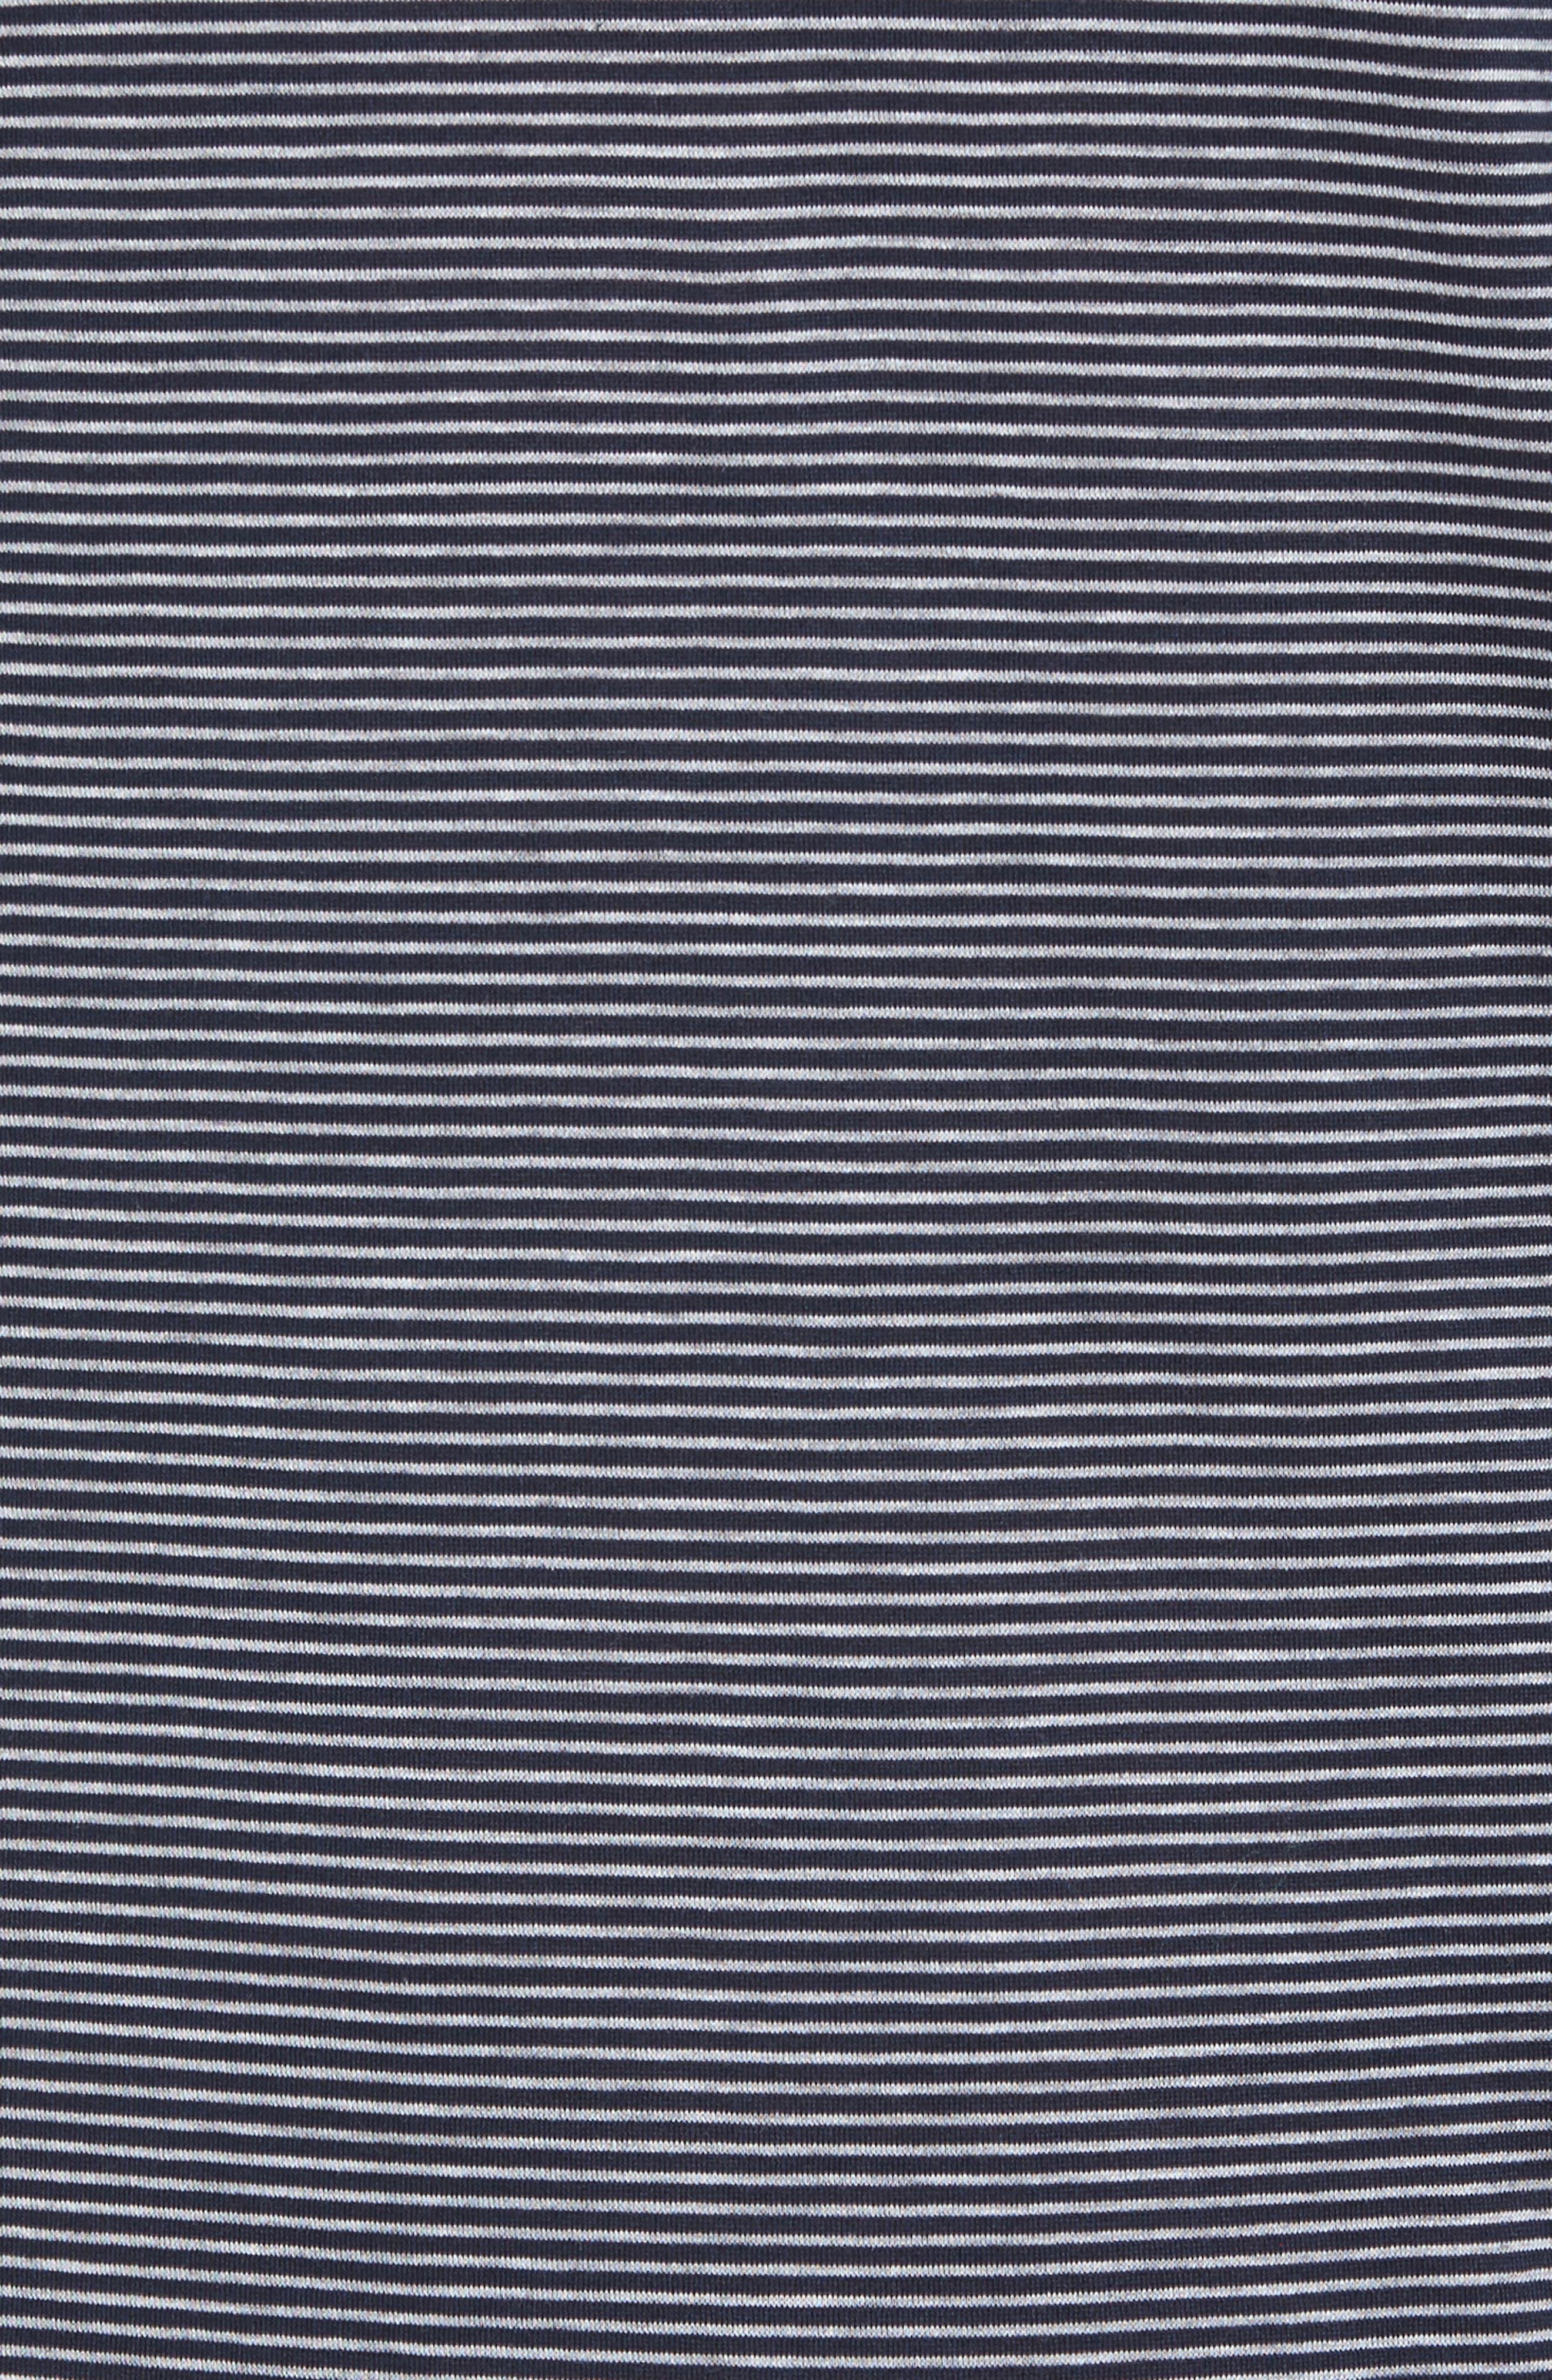 Sporty Stripe Cotton V-Neck T-Shirt,                             Alternate thumbnail 5, color,                             Marine Grey Stripe